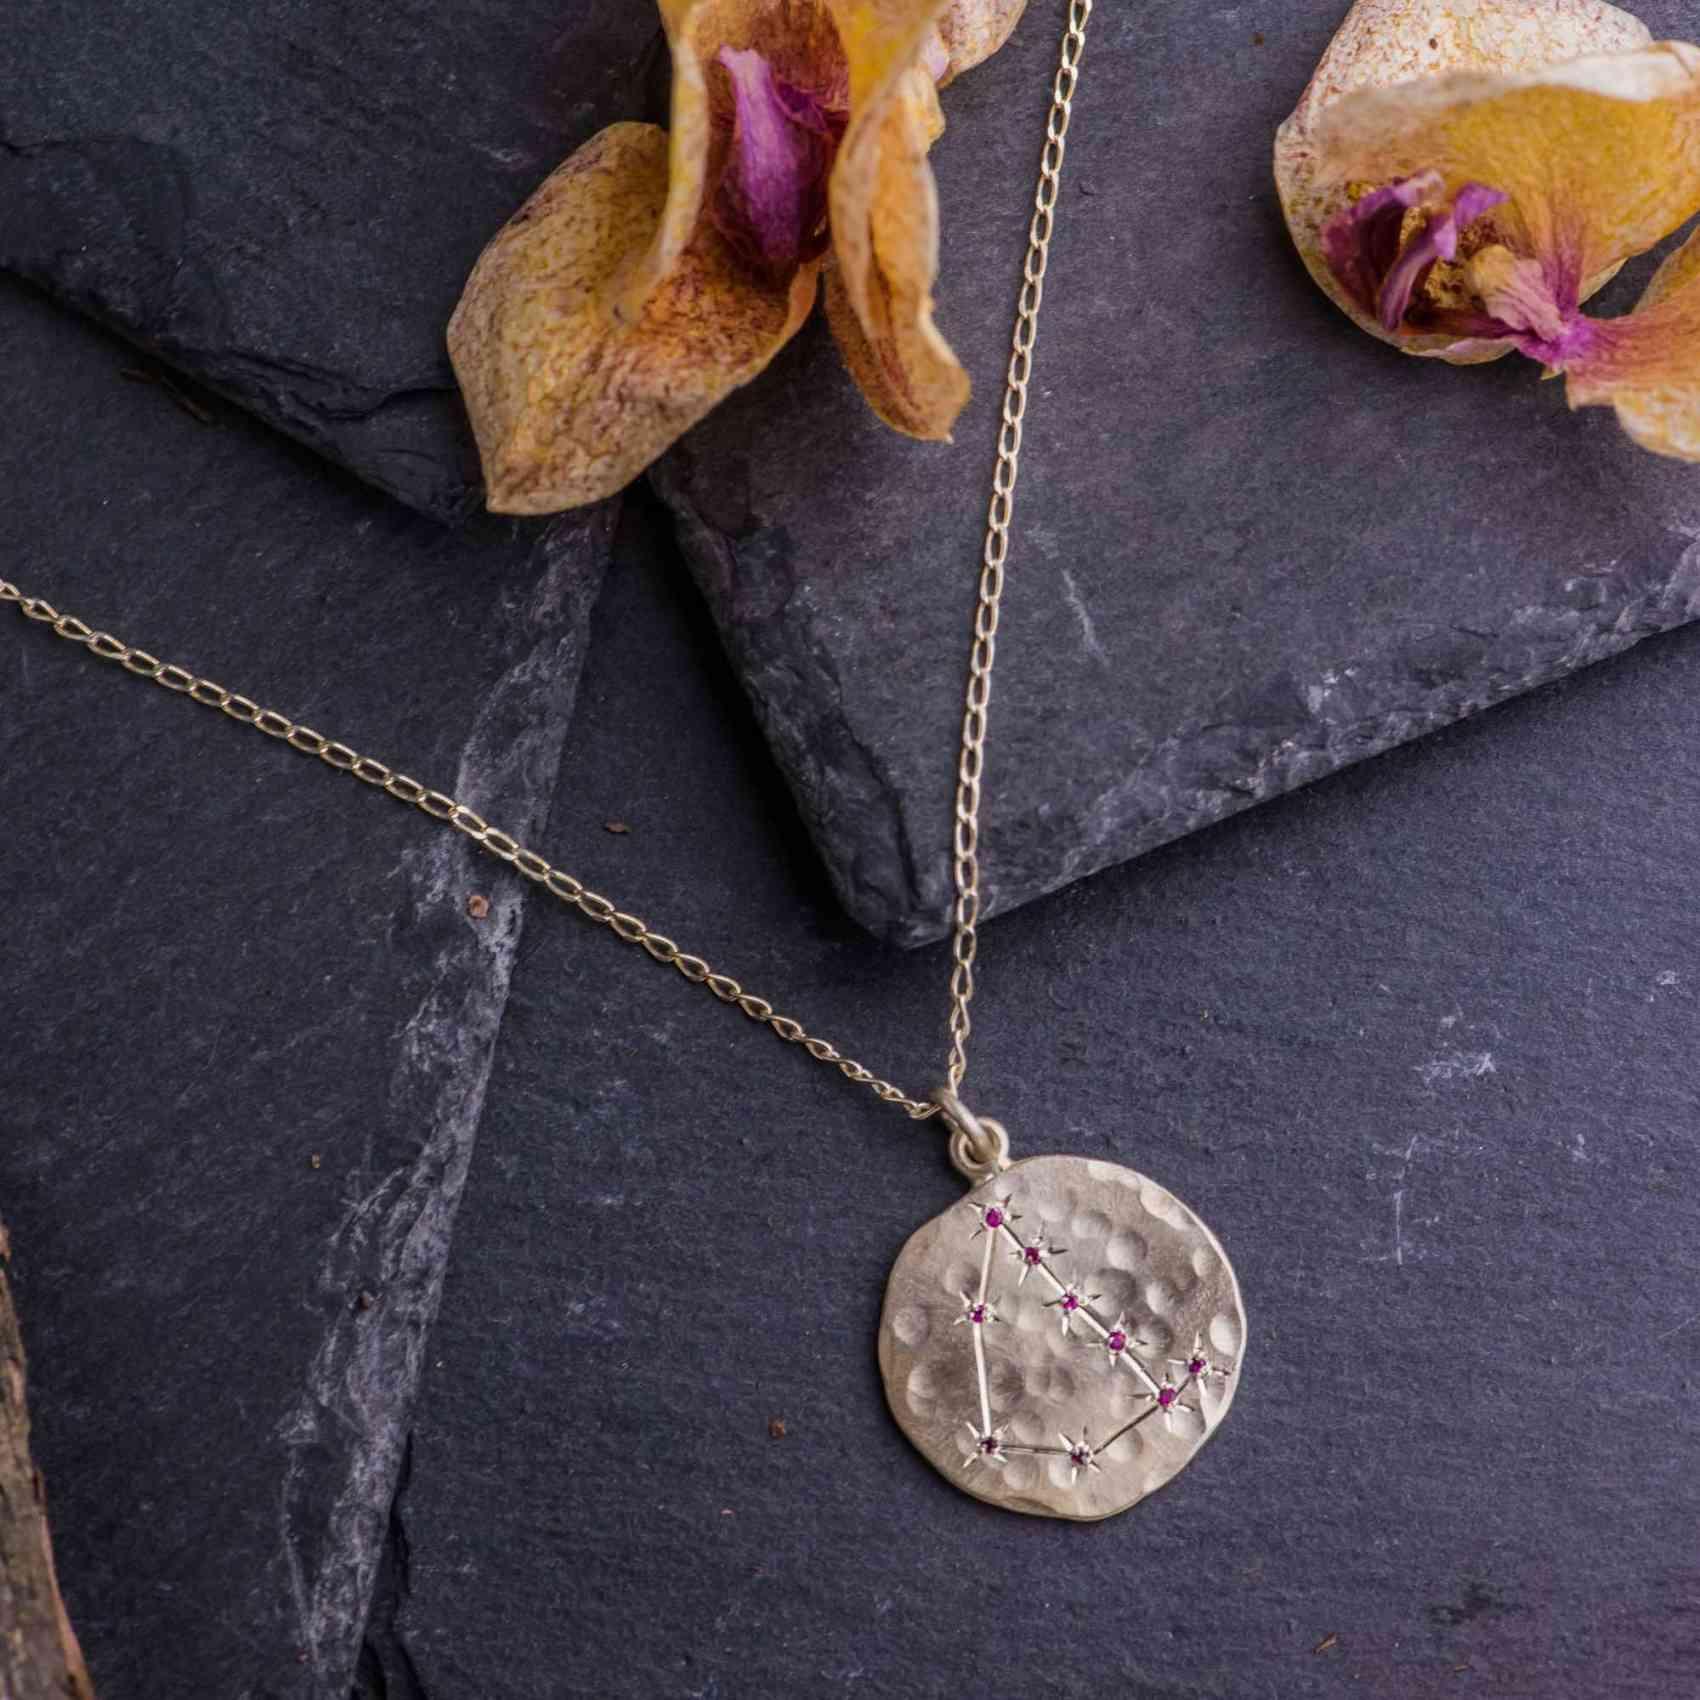 Colier si Pandantiv din Aur Alb 14K cu Rubine Naturale